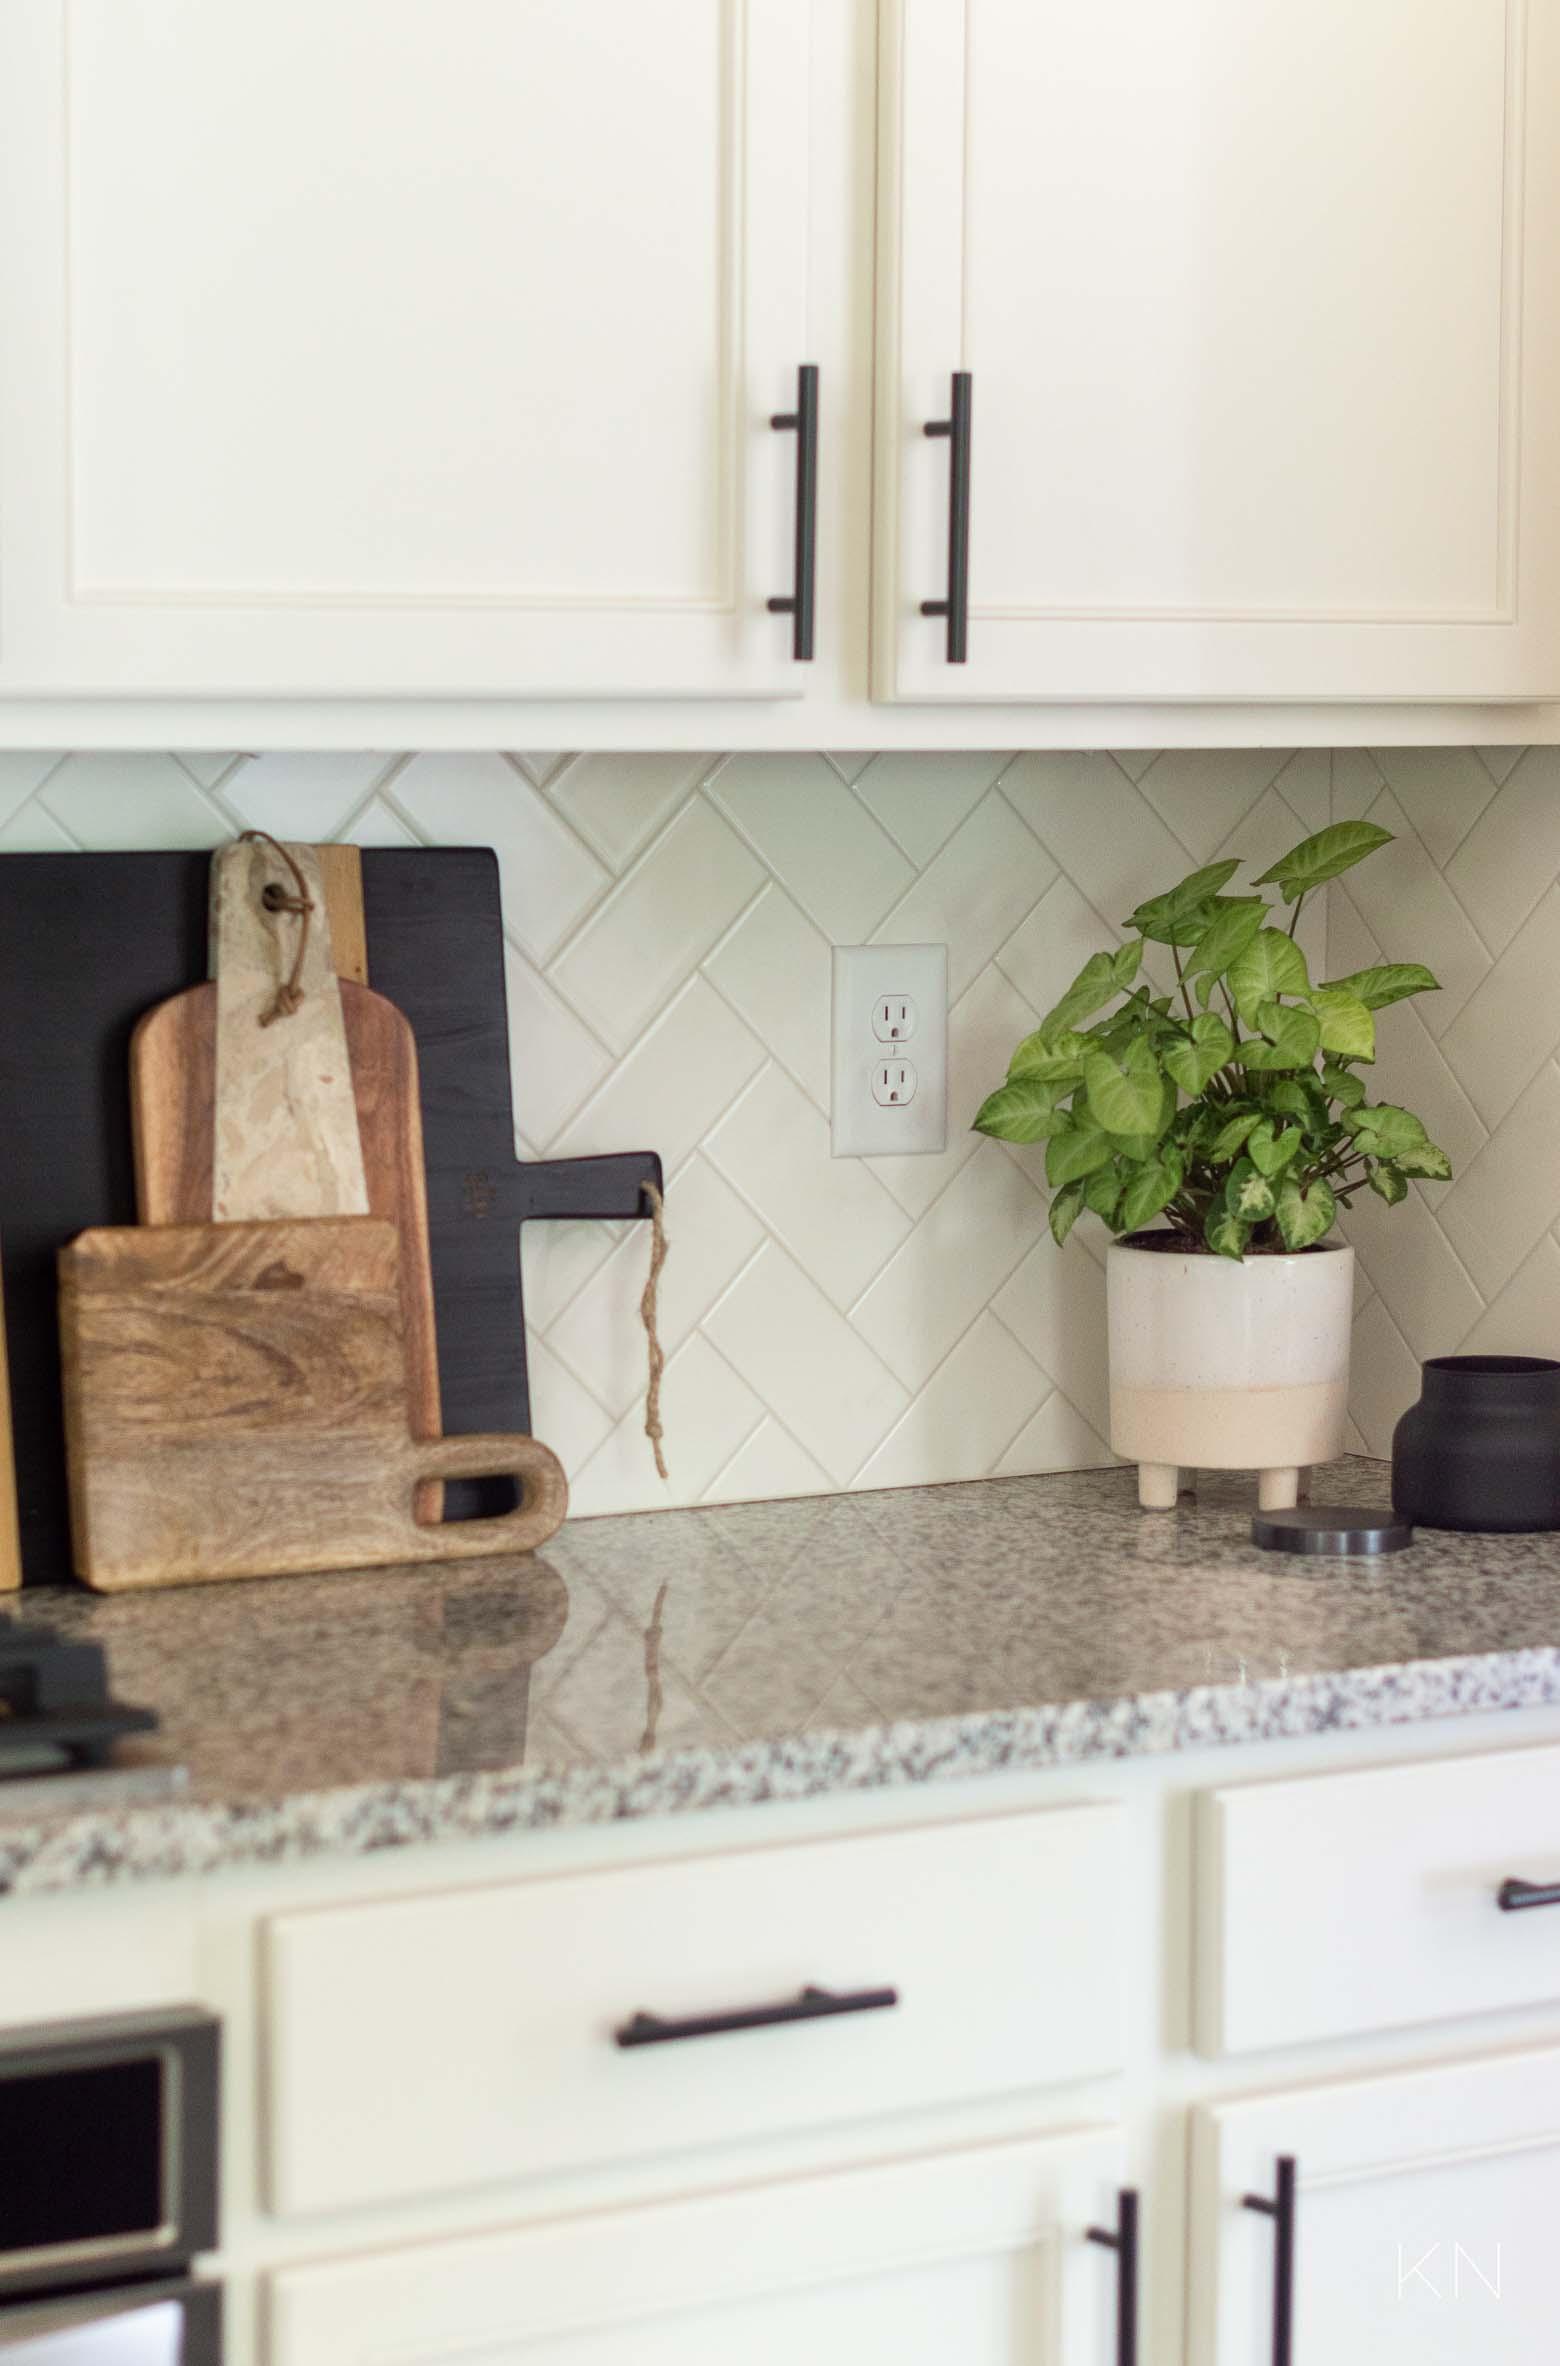 Herringbone White Subway Tile Backsplash and Affordable Ways to Update Your Kitchen